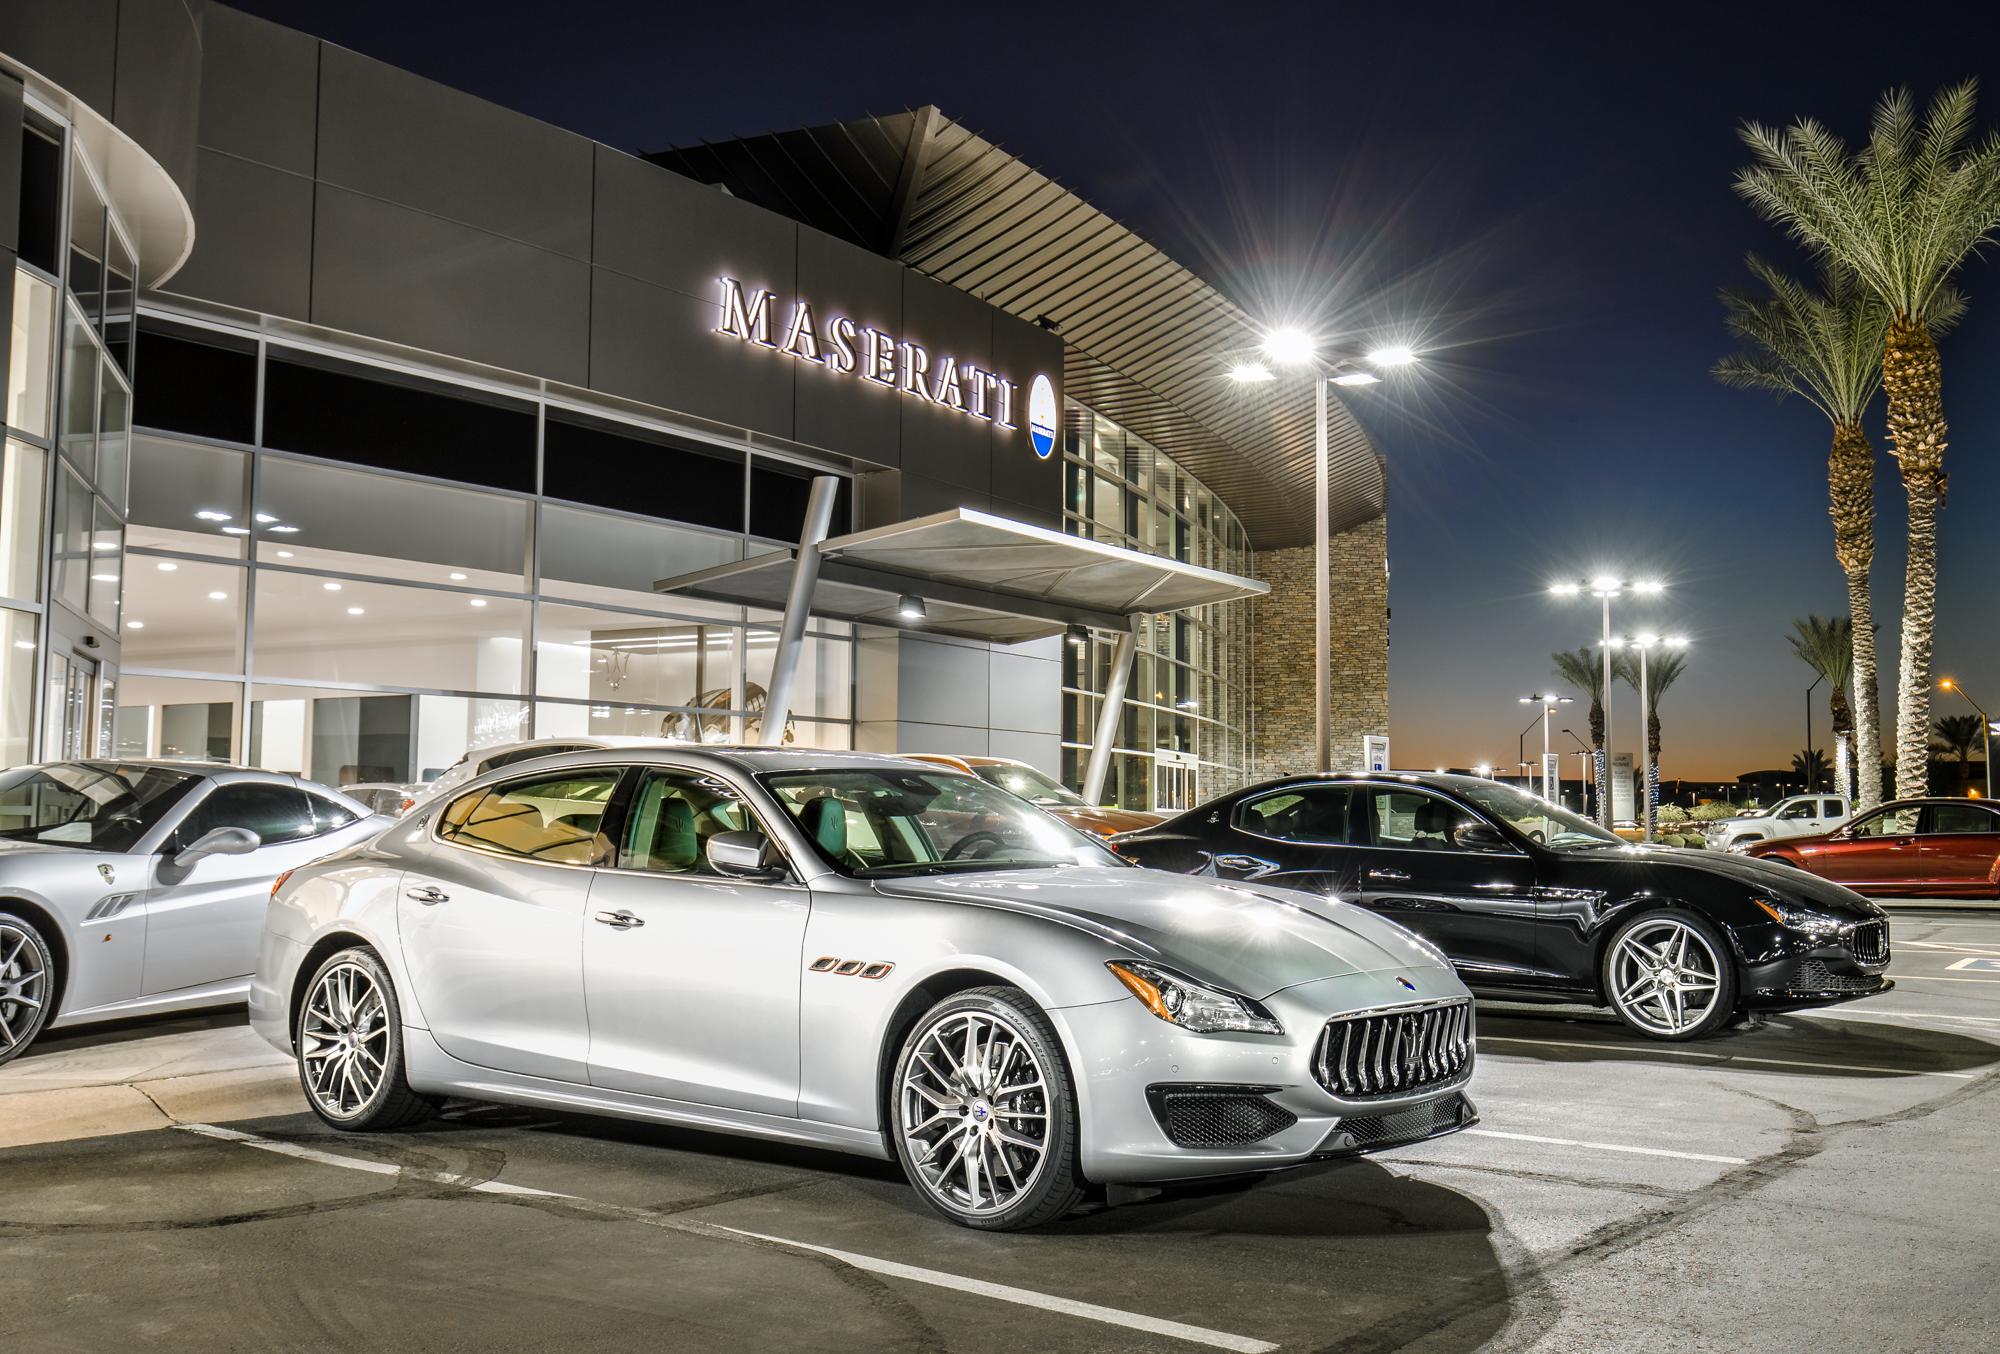 HA Maserati Scottsdale 9_20_17 WEB-2.jpg